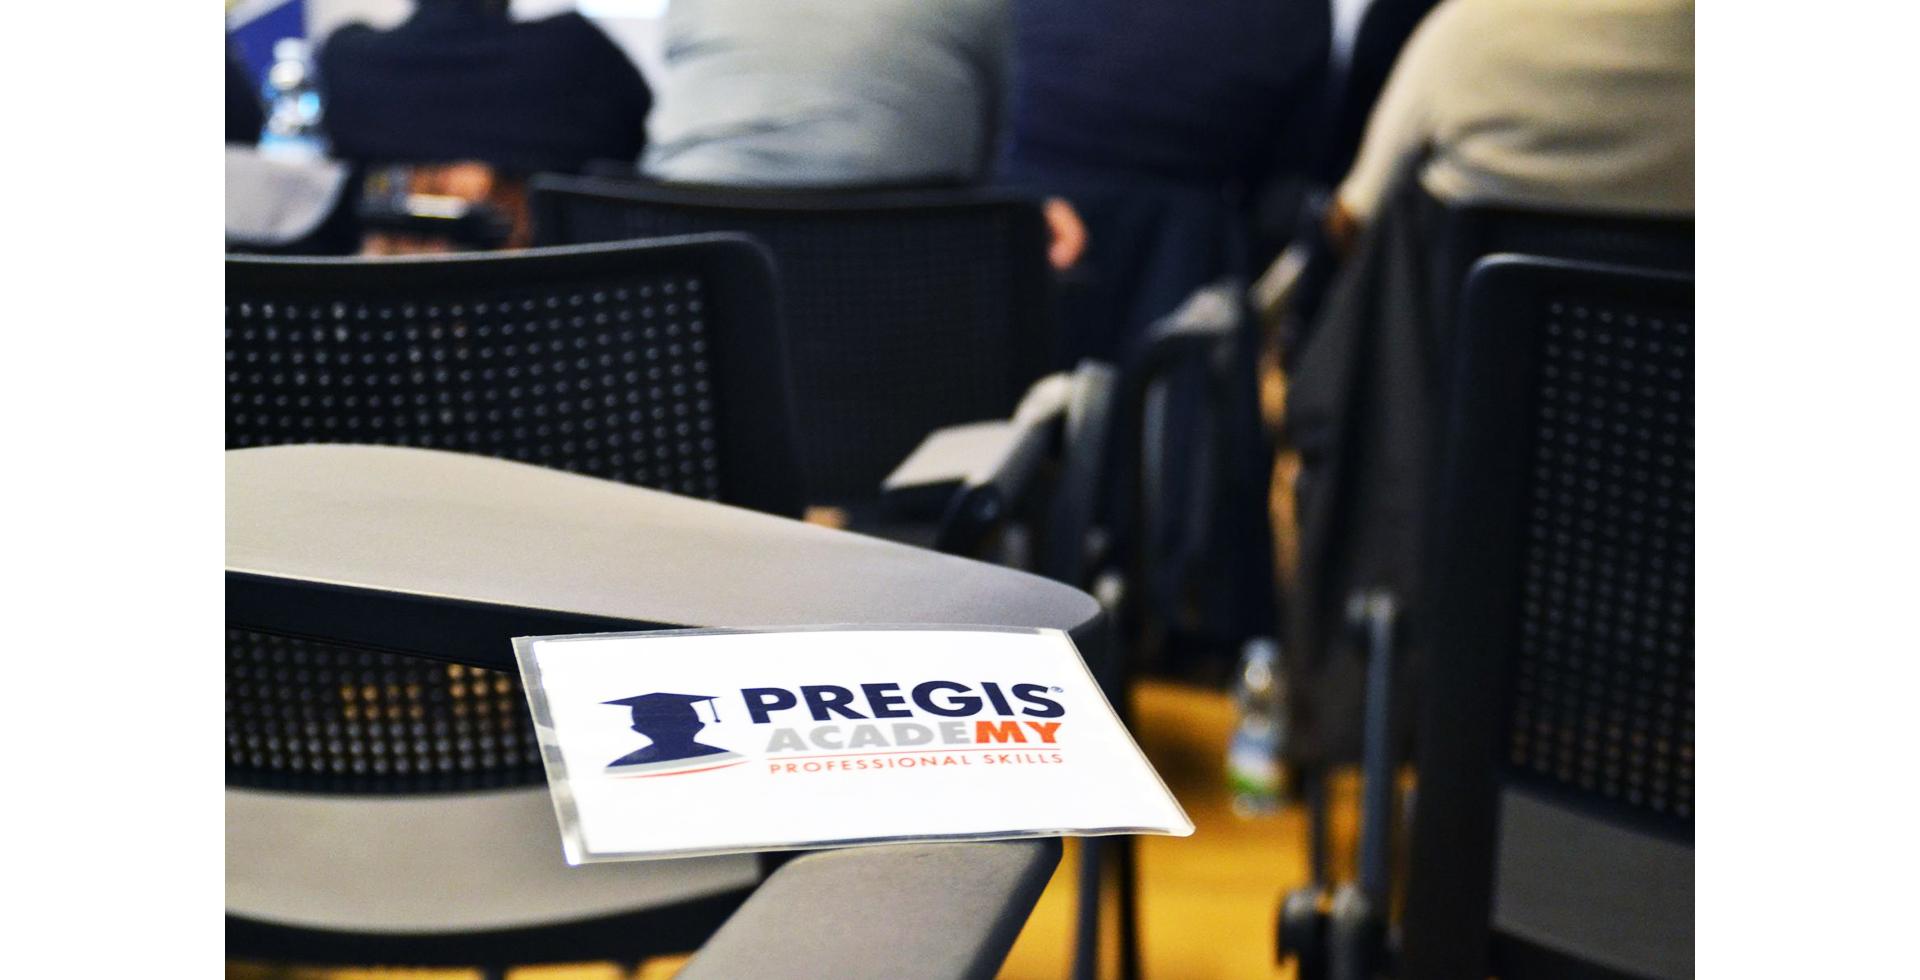 Pregis Academy Udine3